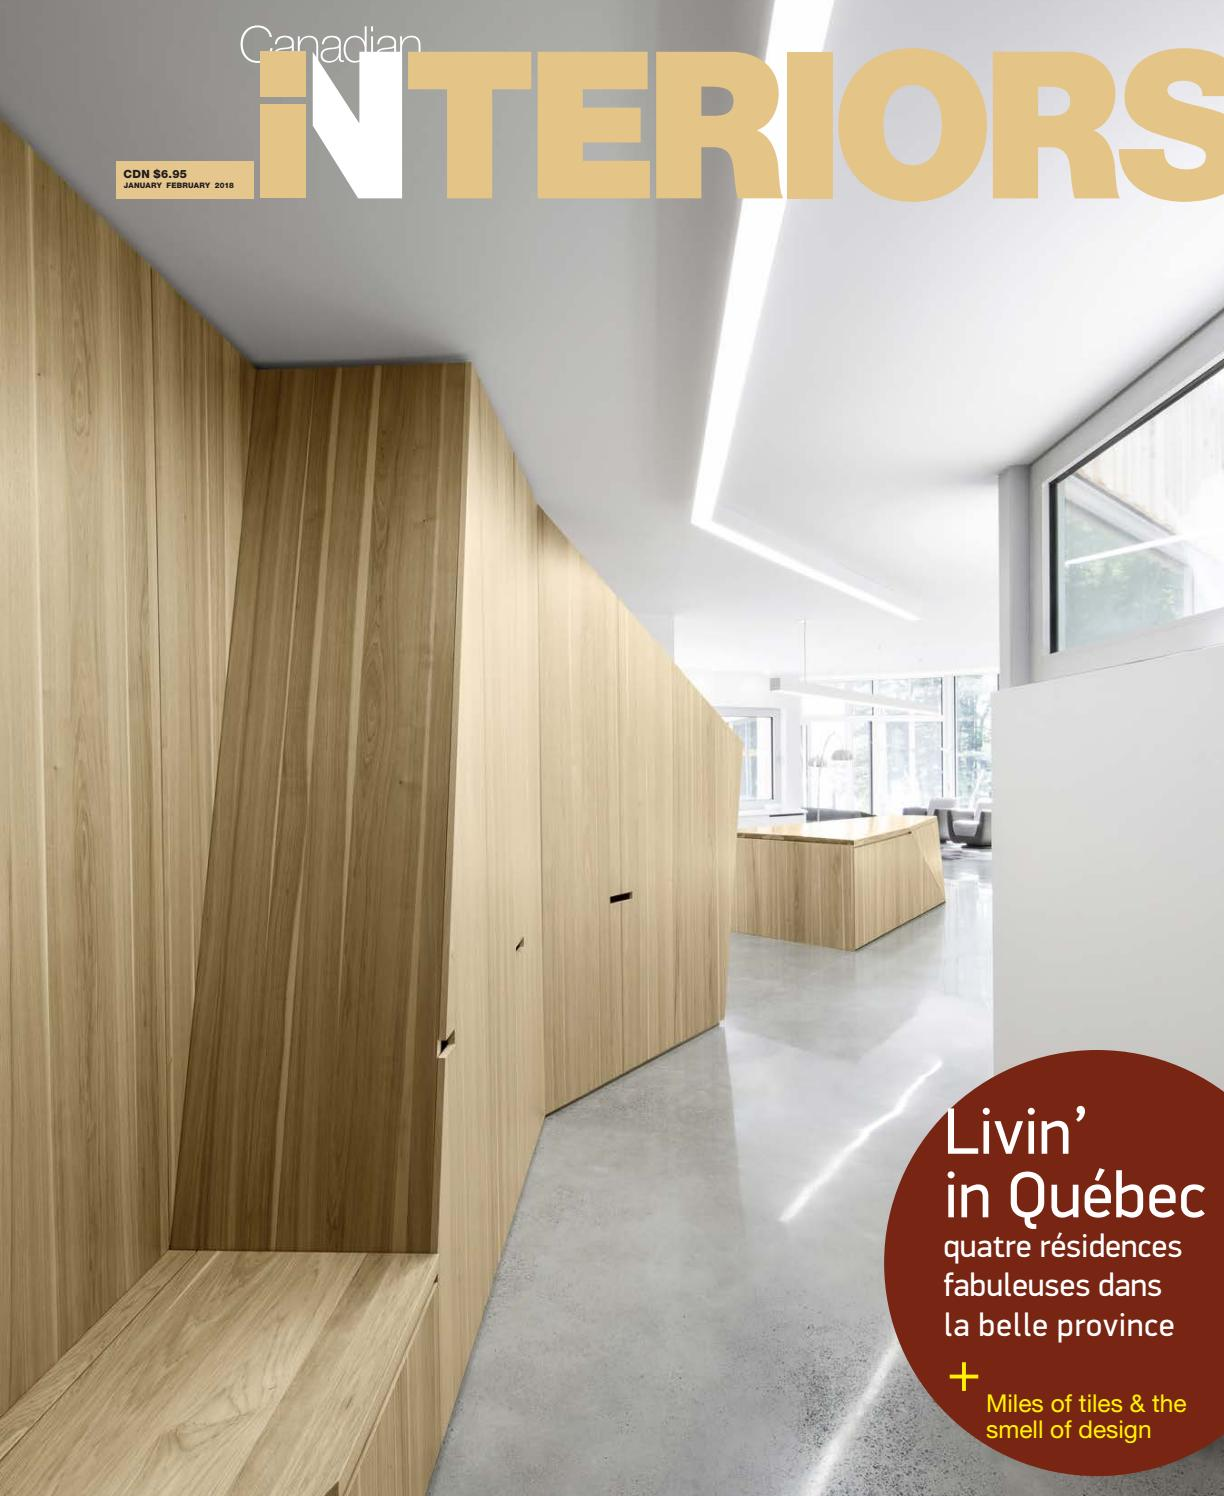 Canadian interiors january february 2018 by iq business media issuu